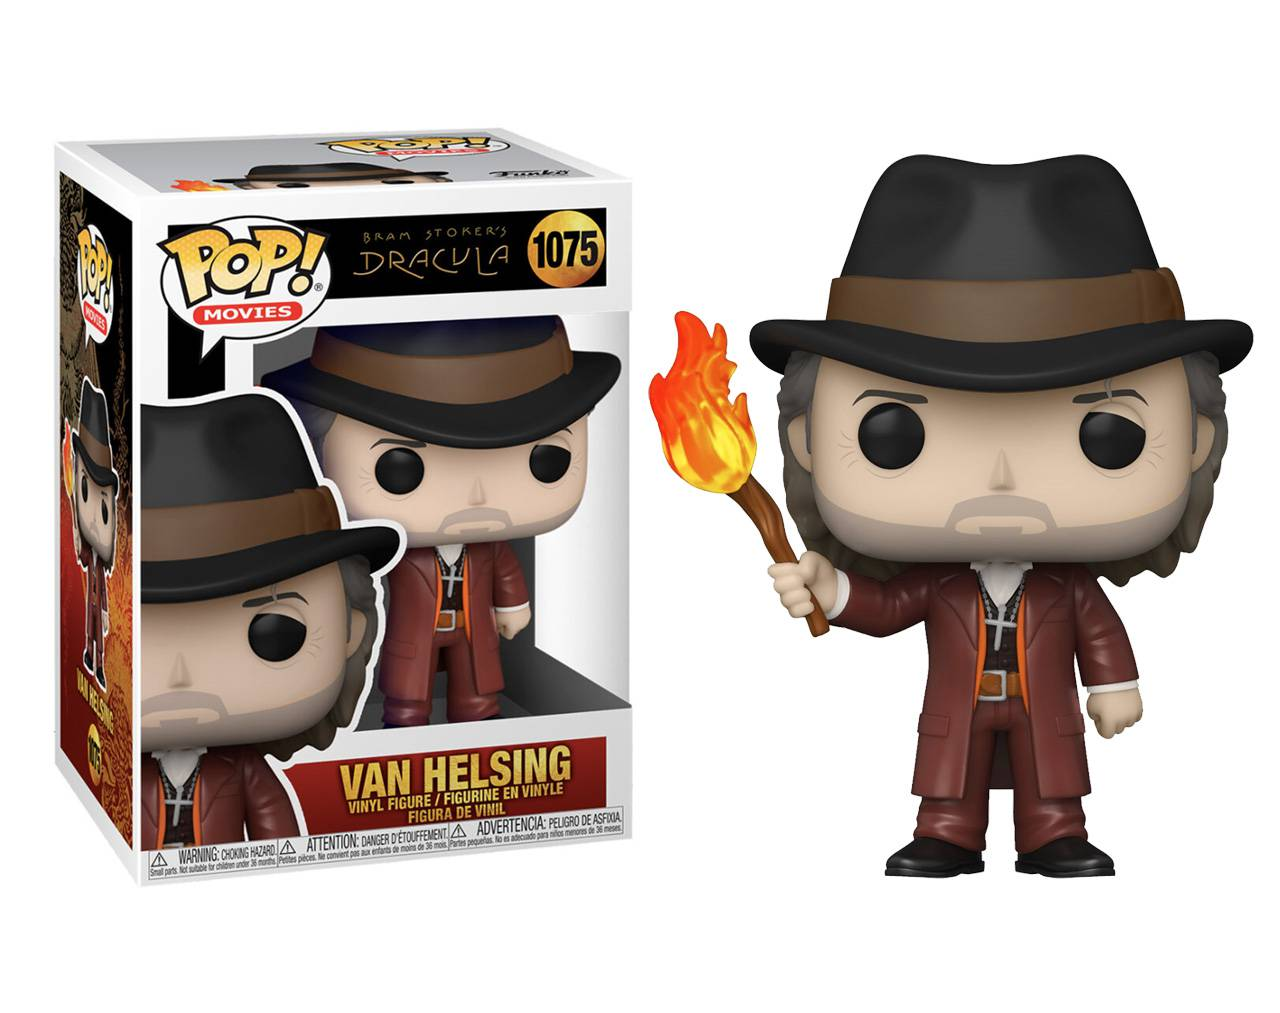 Van Helsing Pop! Vinyl